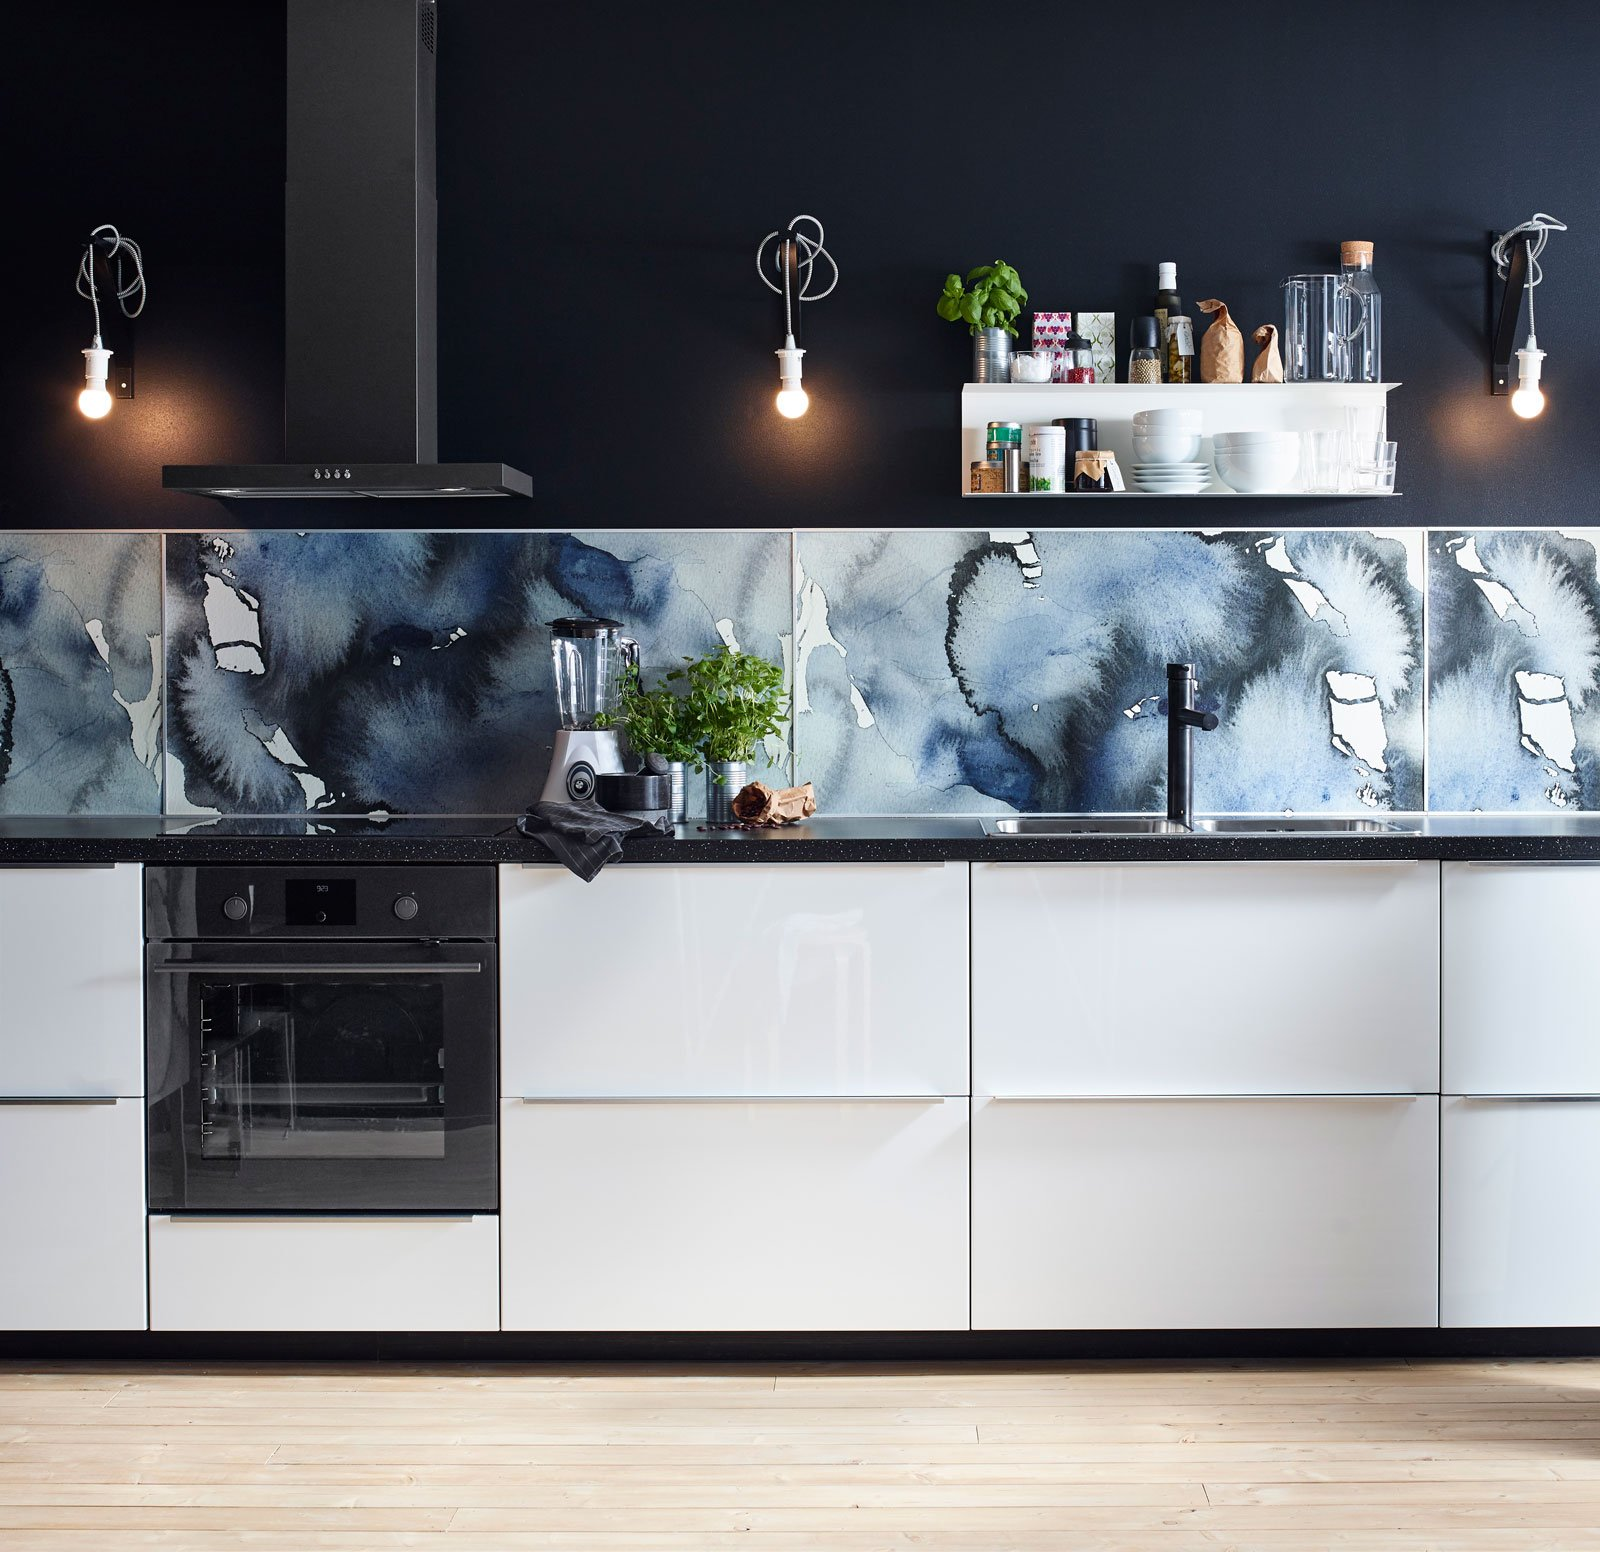 Cucine Moderne Ikea. Amazing Awesome Ikea Cucine Complete Gallery ...